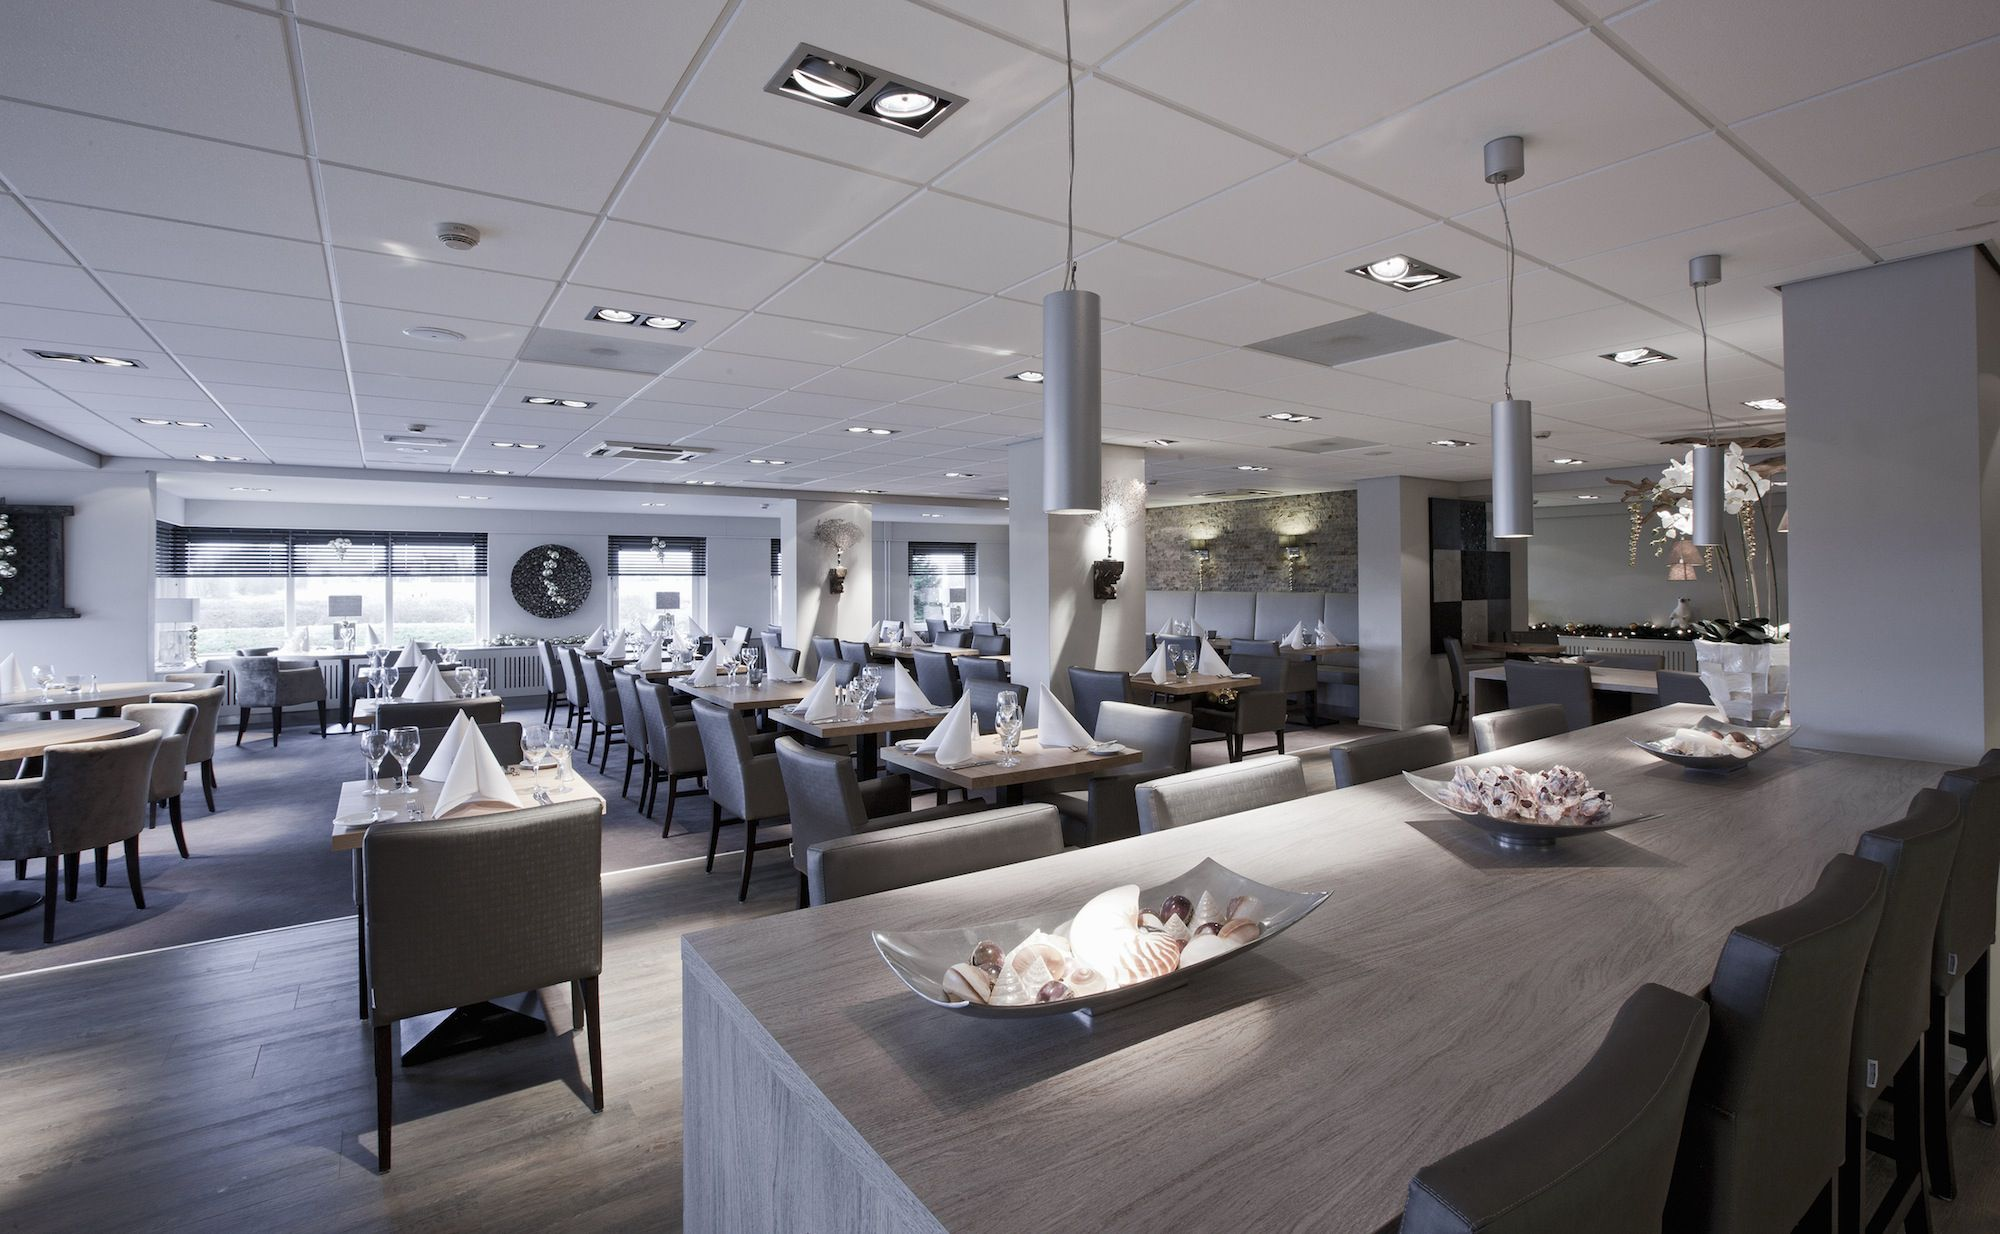 Modern restaurant table setting - Restaurant Layout And Design Basics